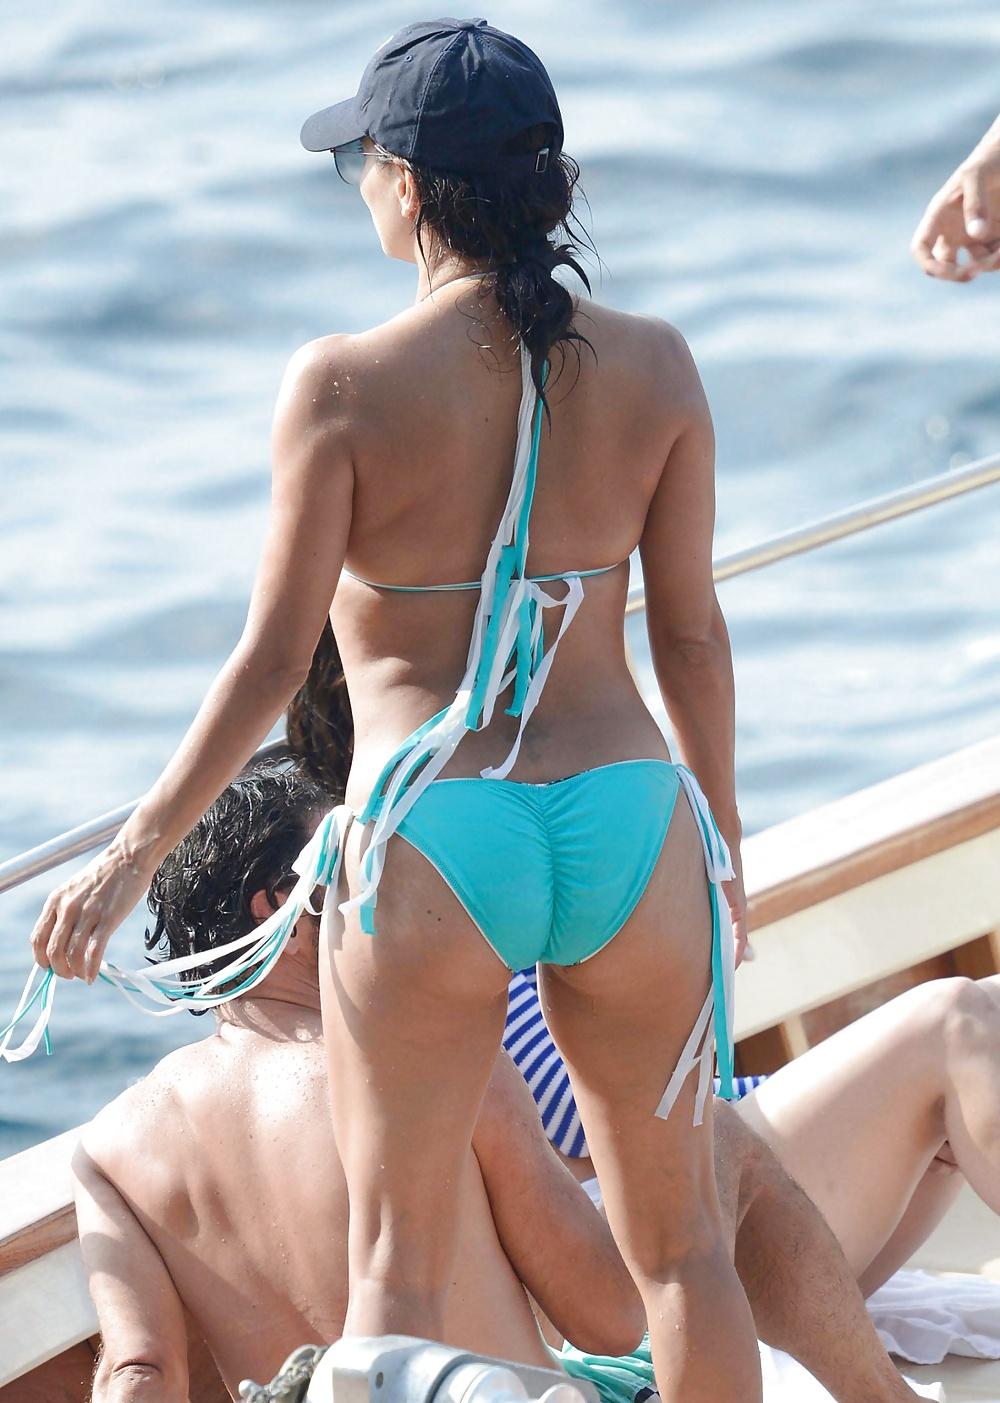 Eva longoria hot ass, sexy girlfriends being fucked